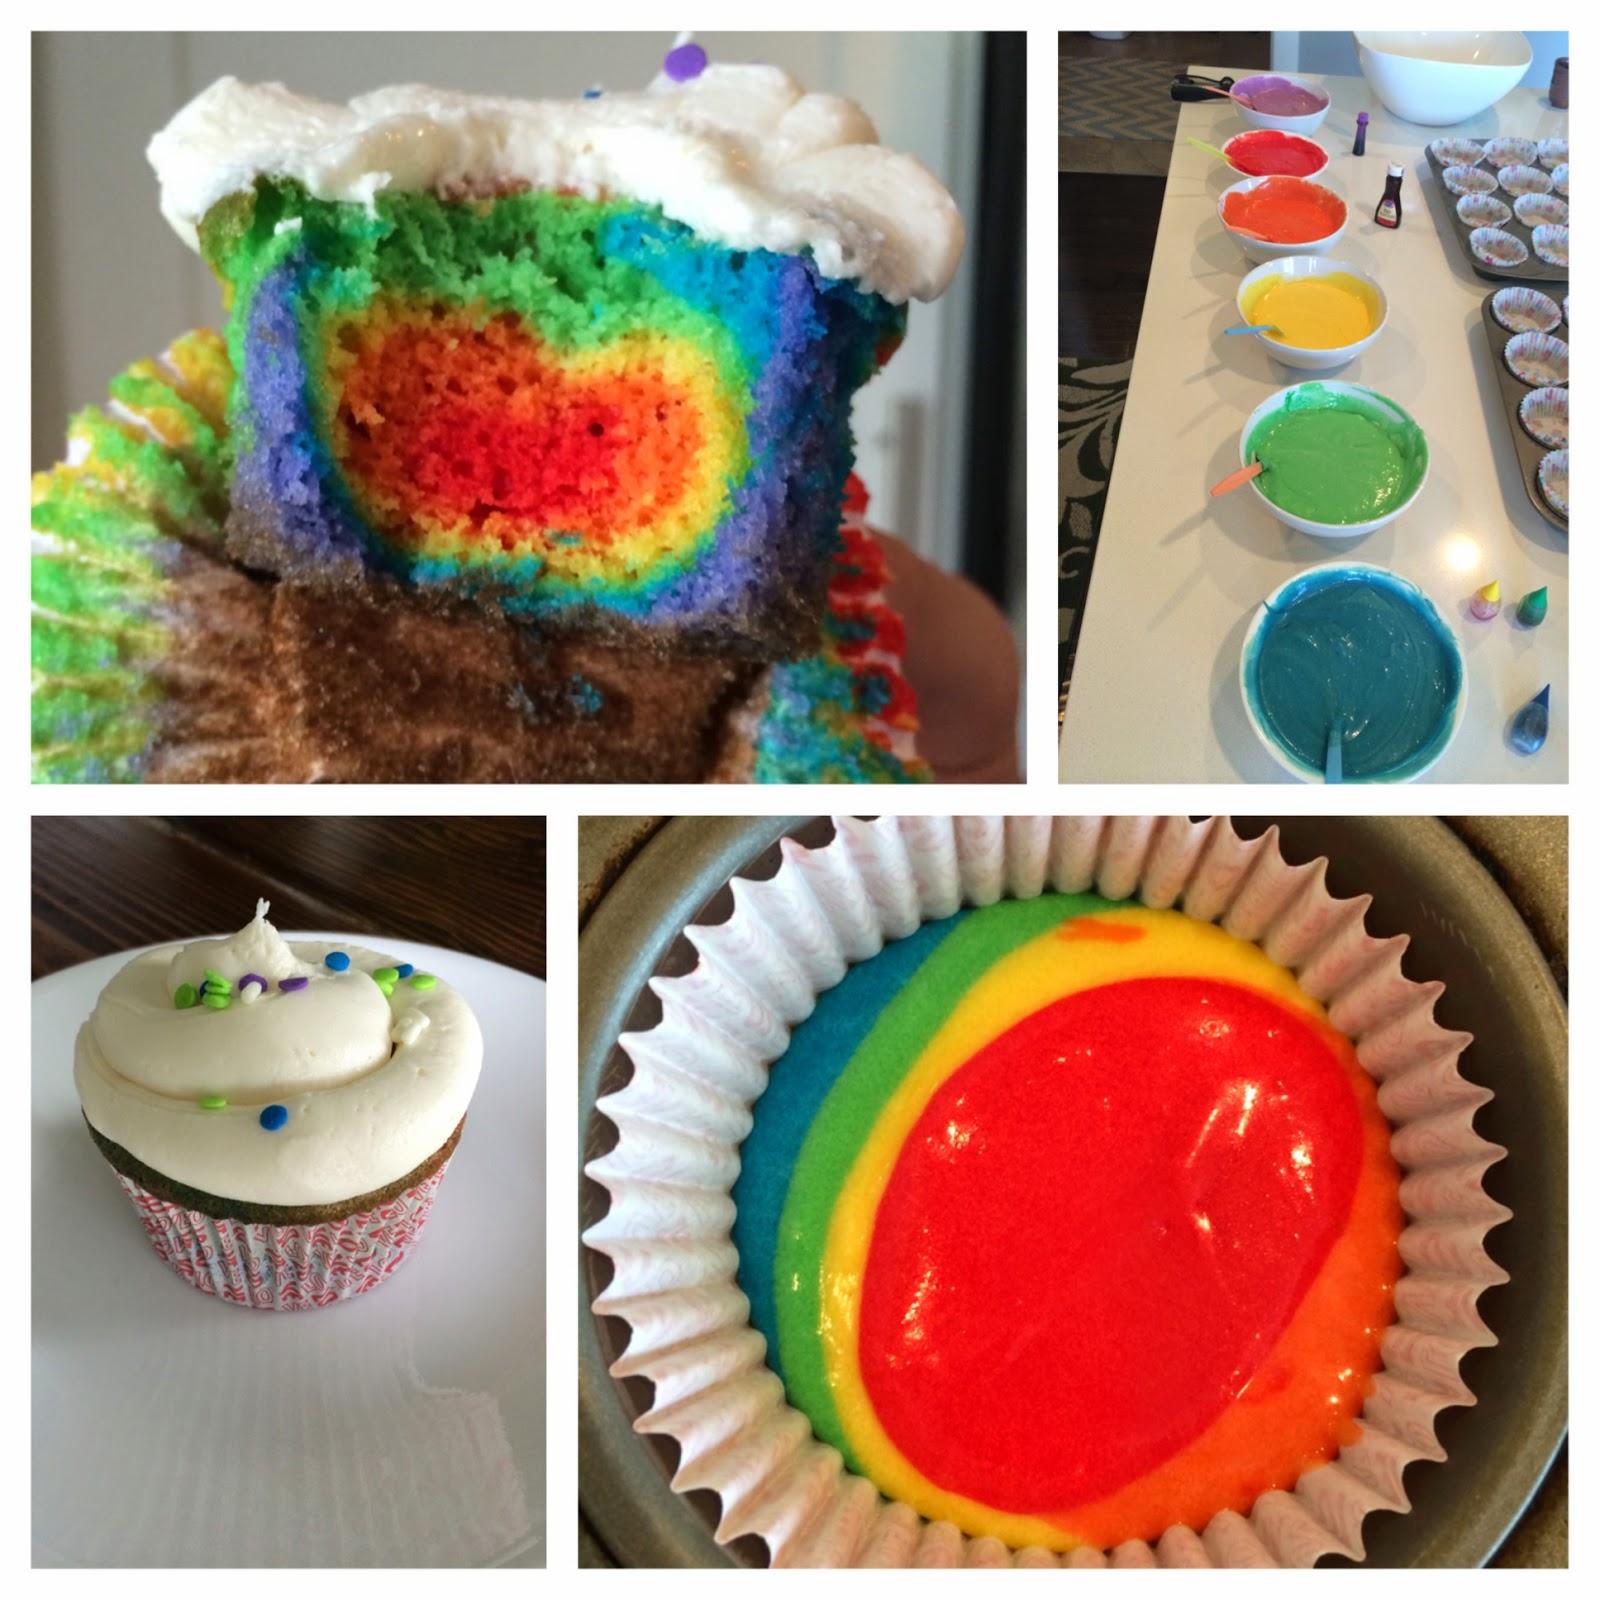 Can U Use Cake Mix To Make Cupcakes